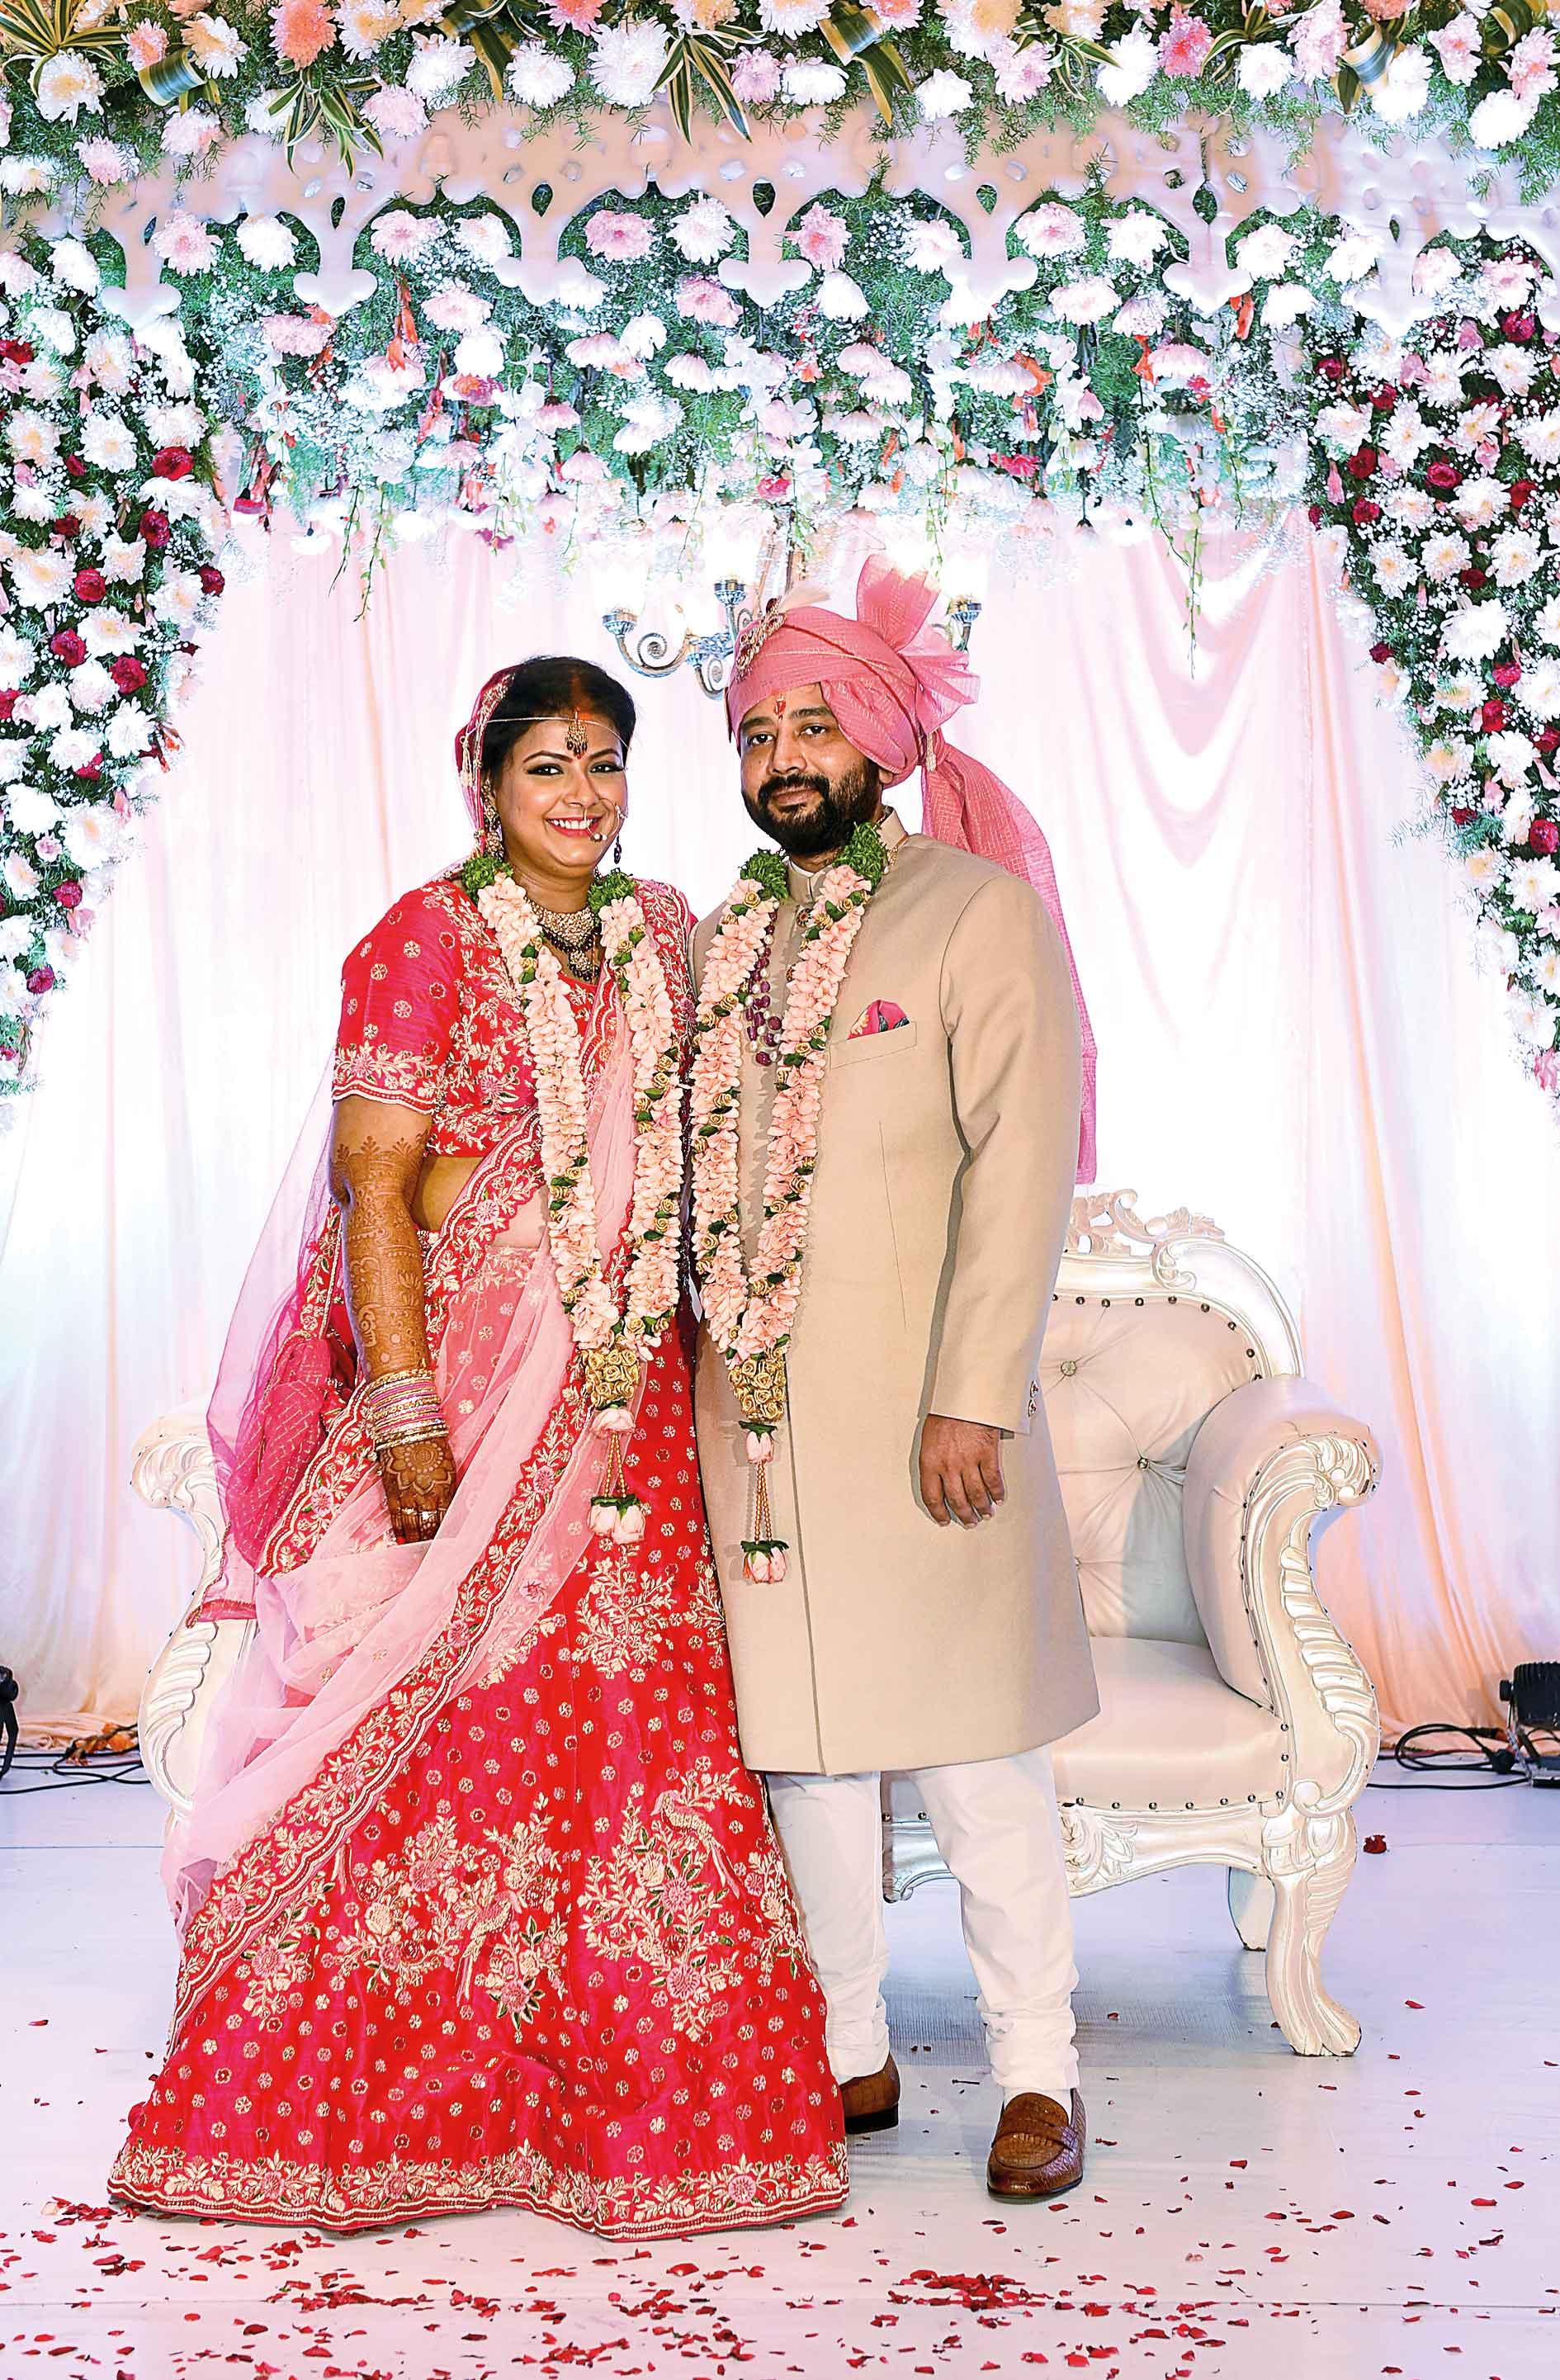 pg3_wedding4